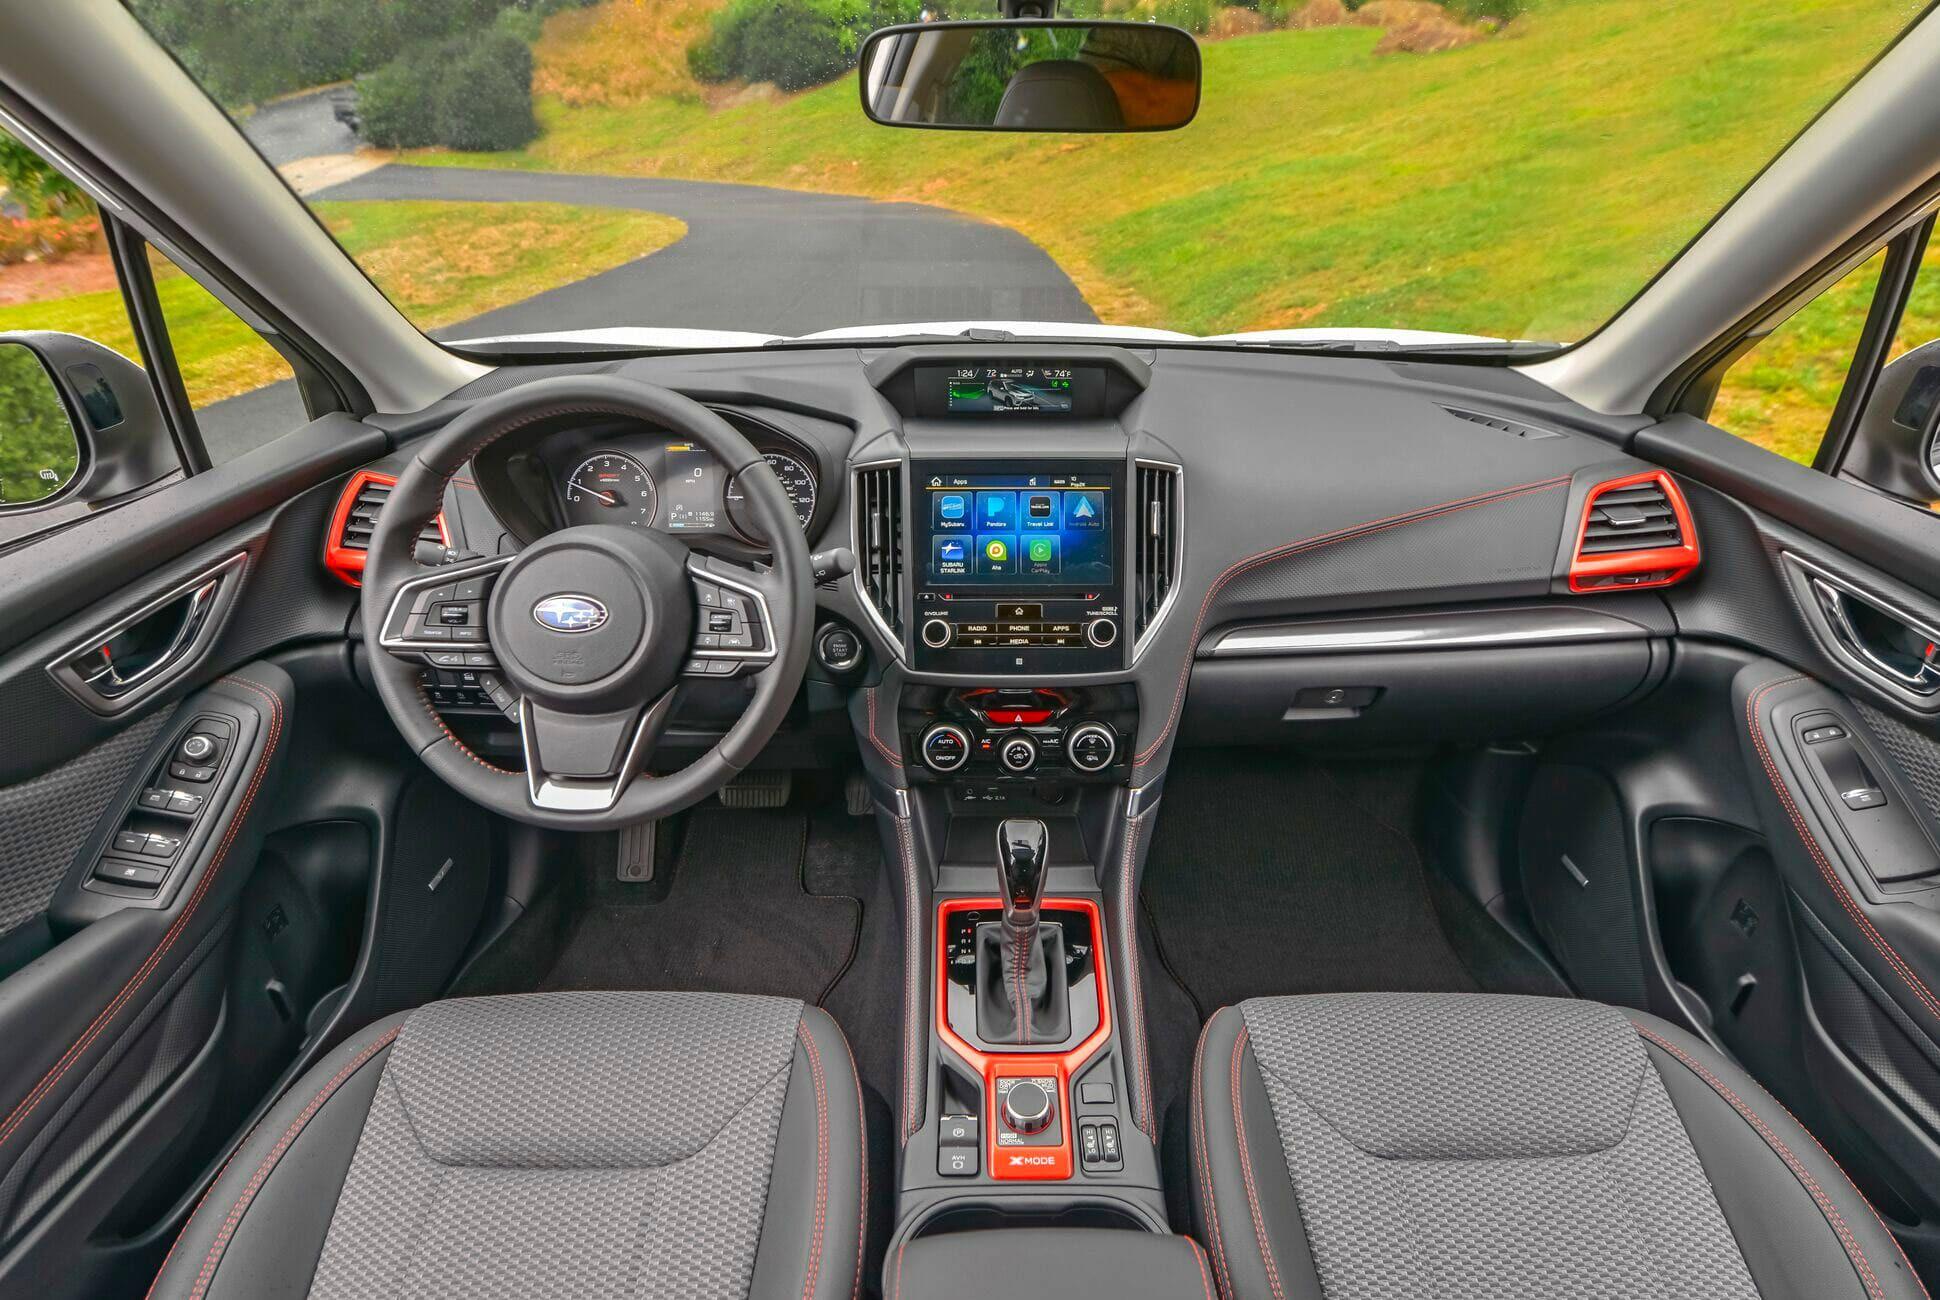 2019-Subaru-Forester-Gear-Patrol-Slide-5